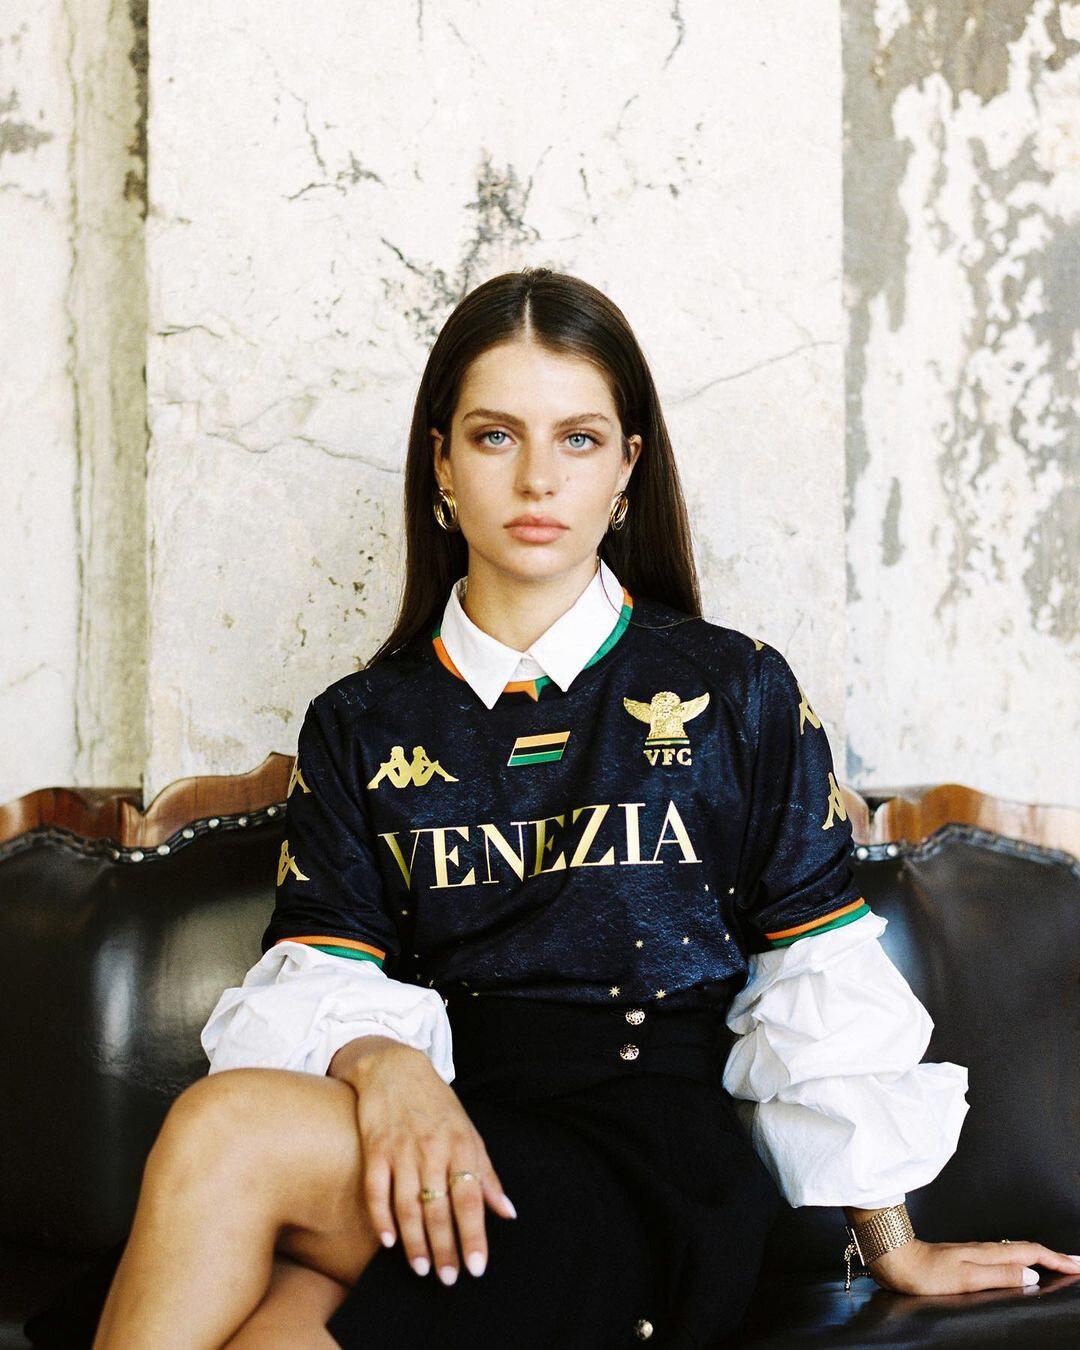 Venezia FC Home Kit 2021-22